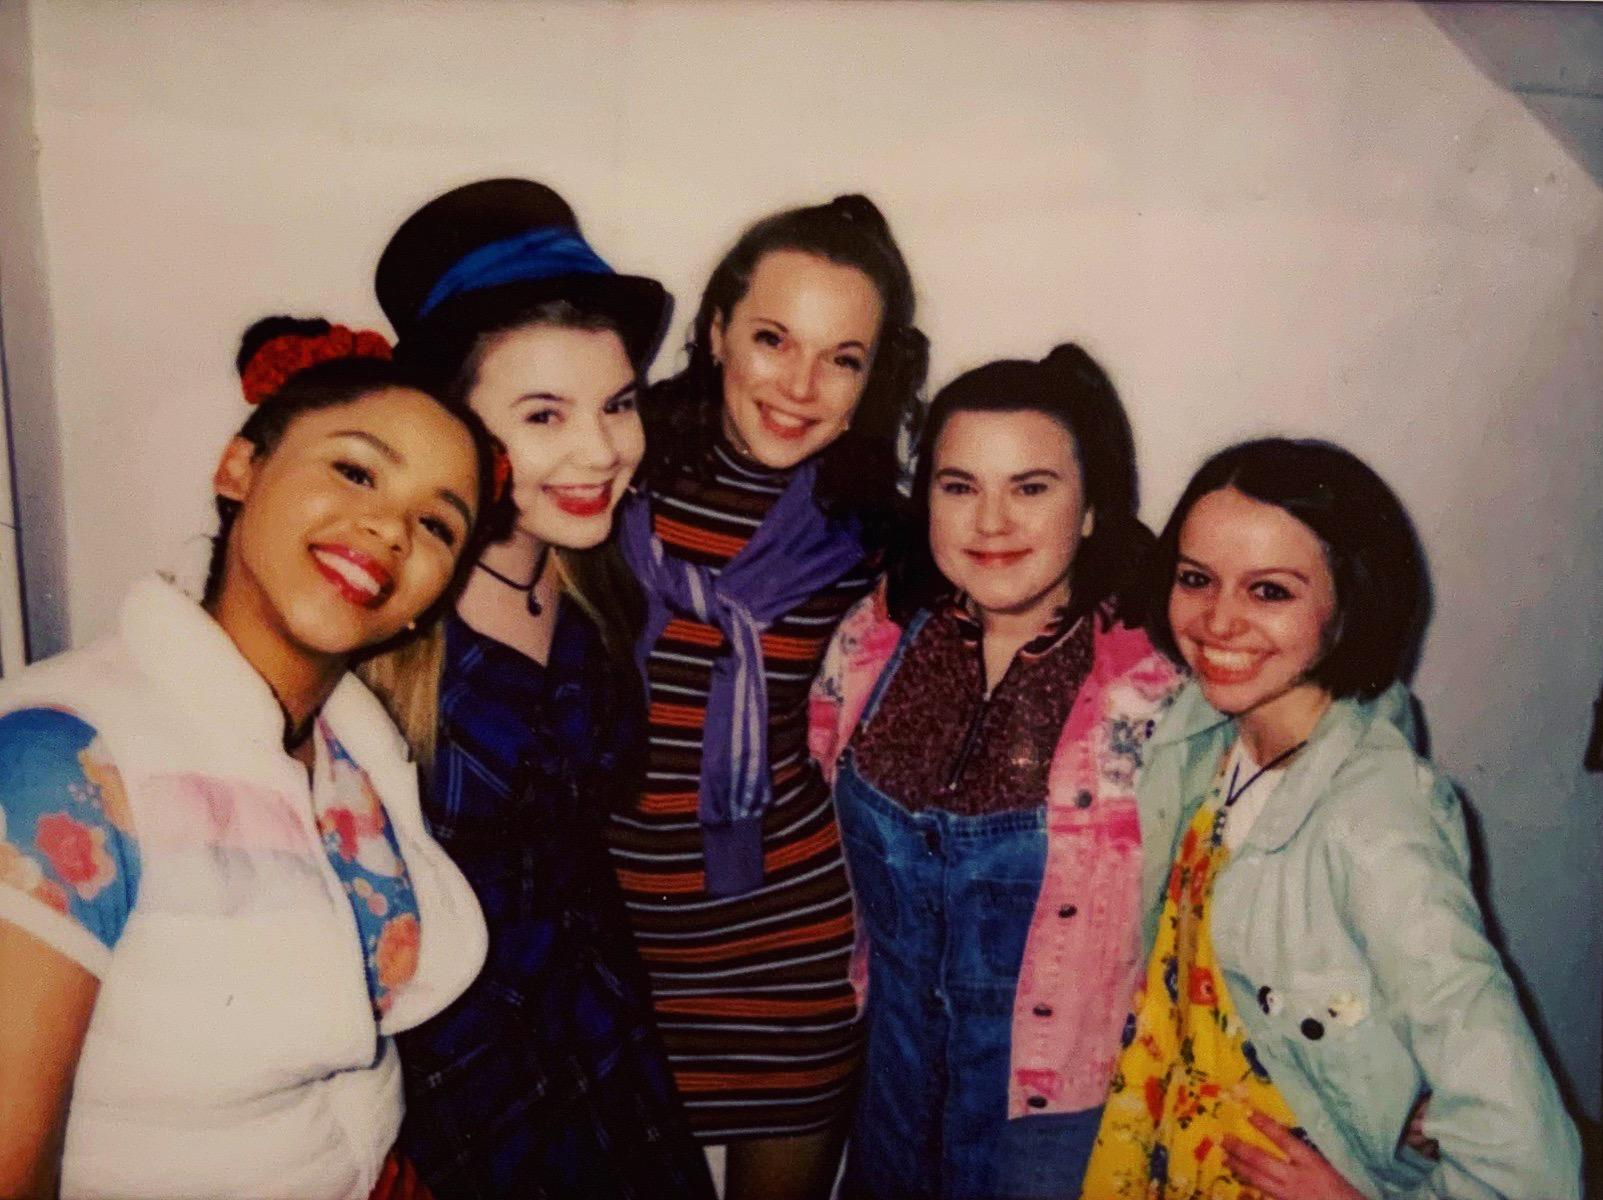 The Band West End Debut Polaroid (Rachelle Diedericks, Katy Clayton, Sarah Kate Howarth, Faye Christall & Lauren Jacobs)